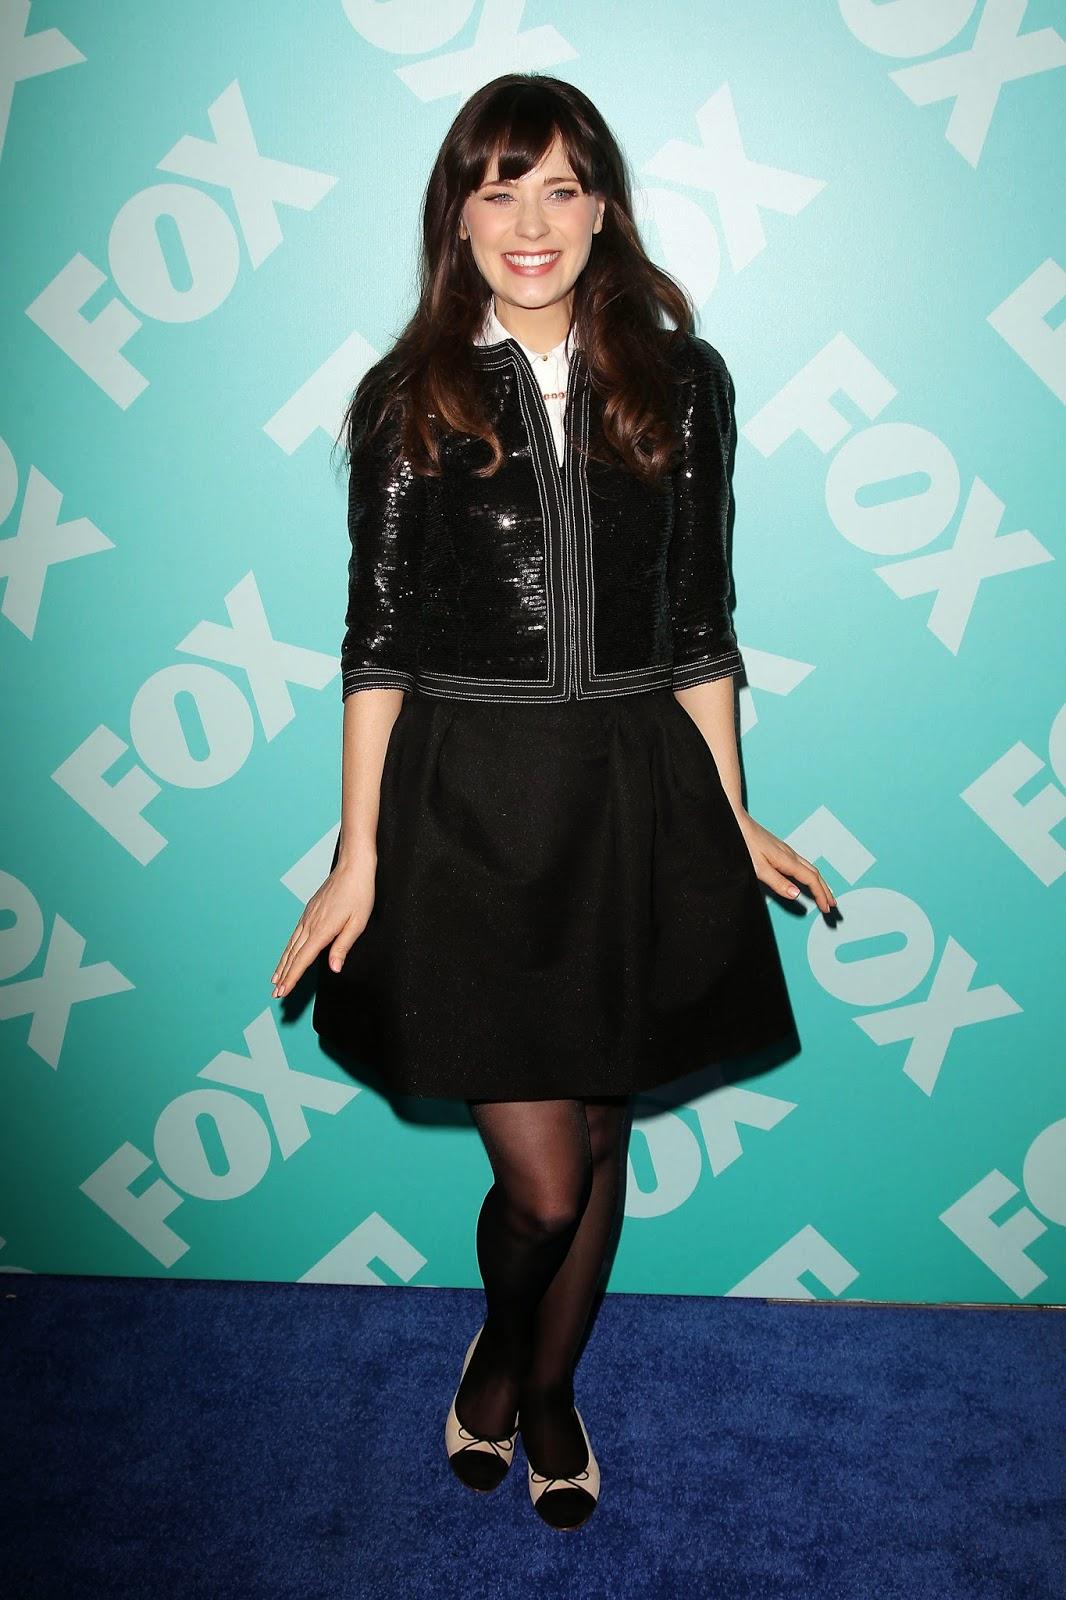 Red Carpet Dresses Zooey Deschanel Fox Upfronts 2013